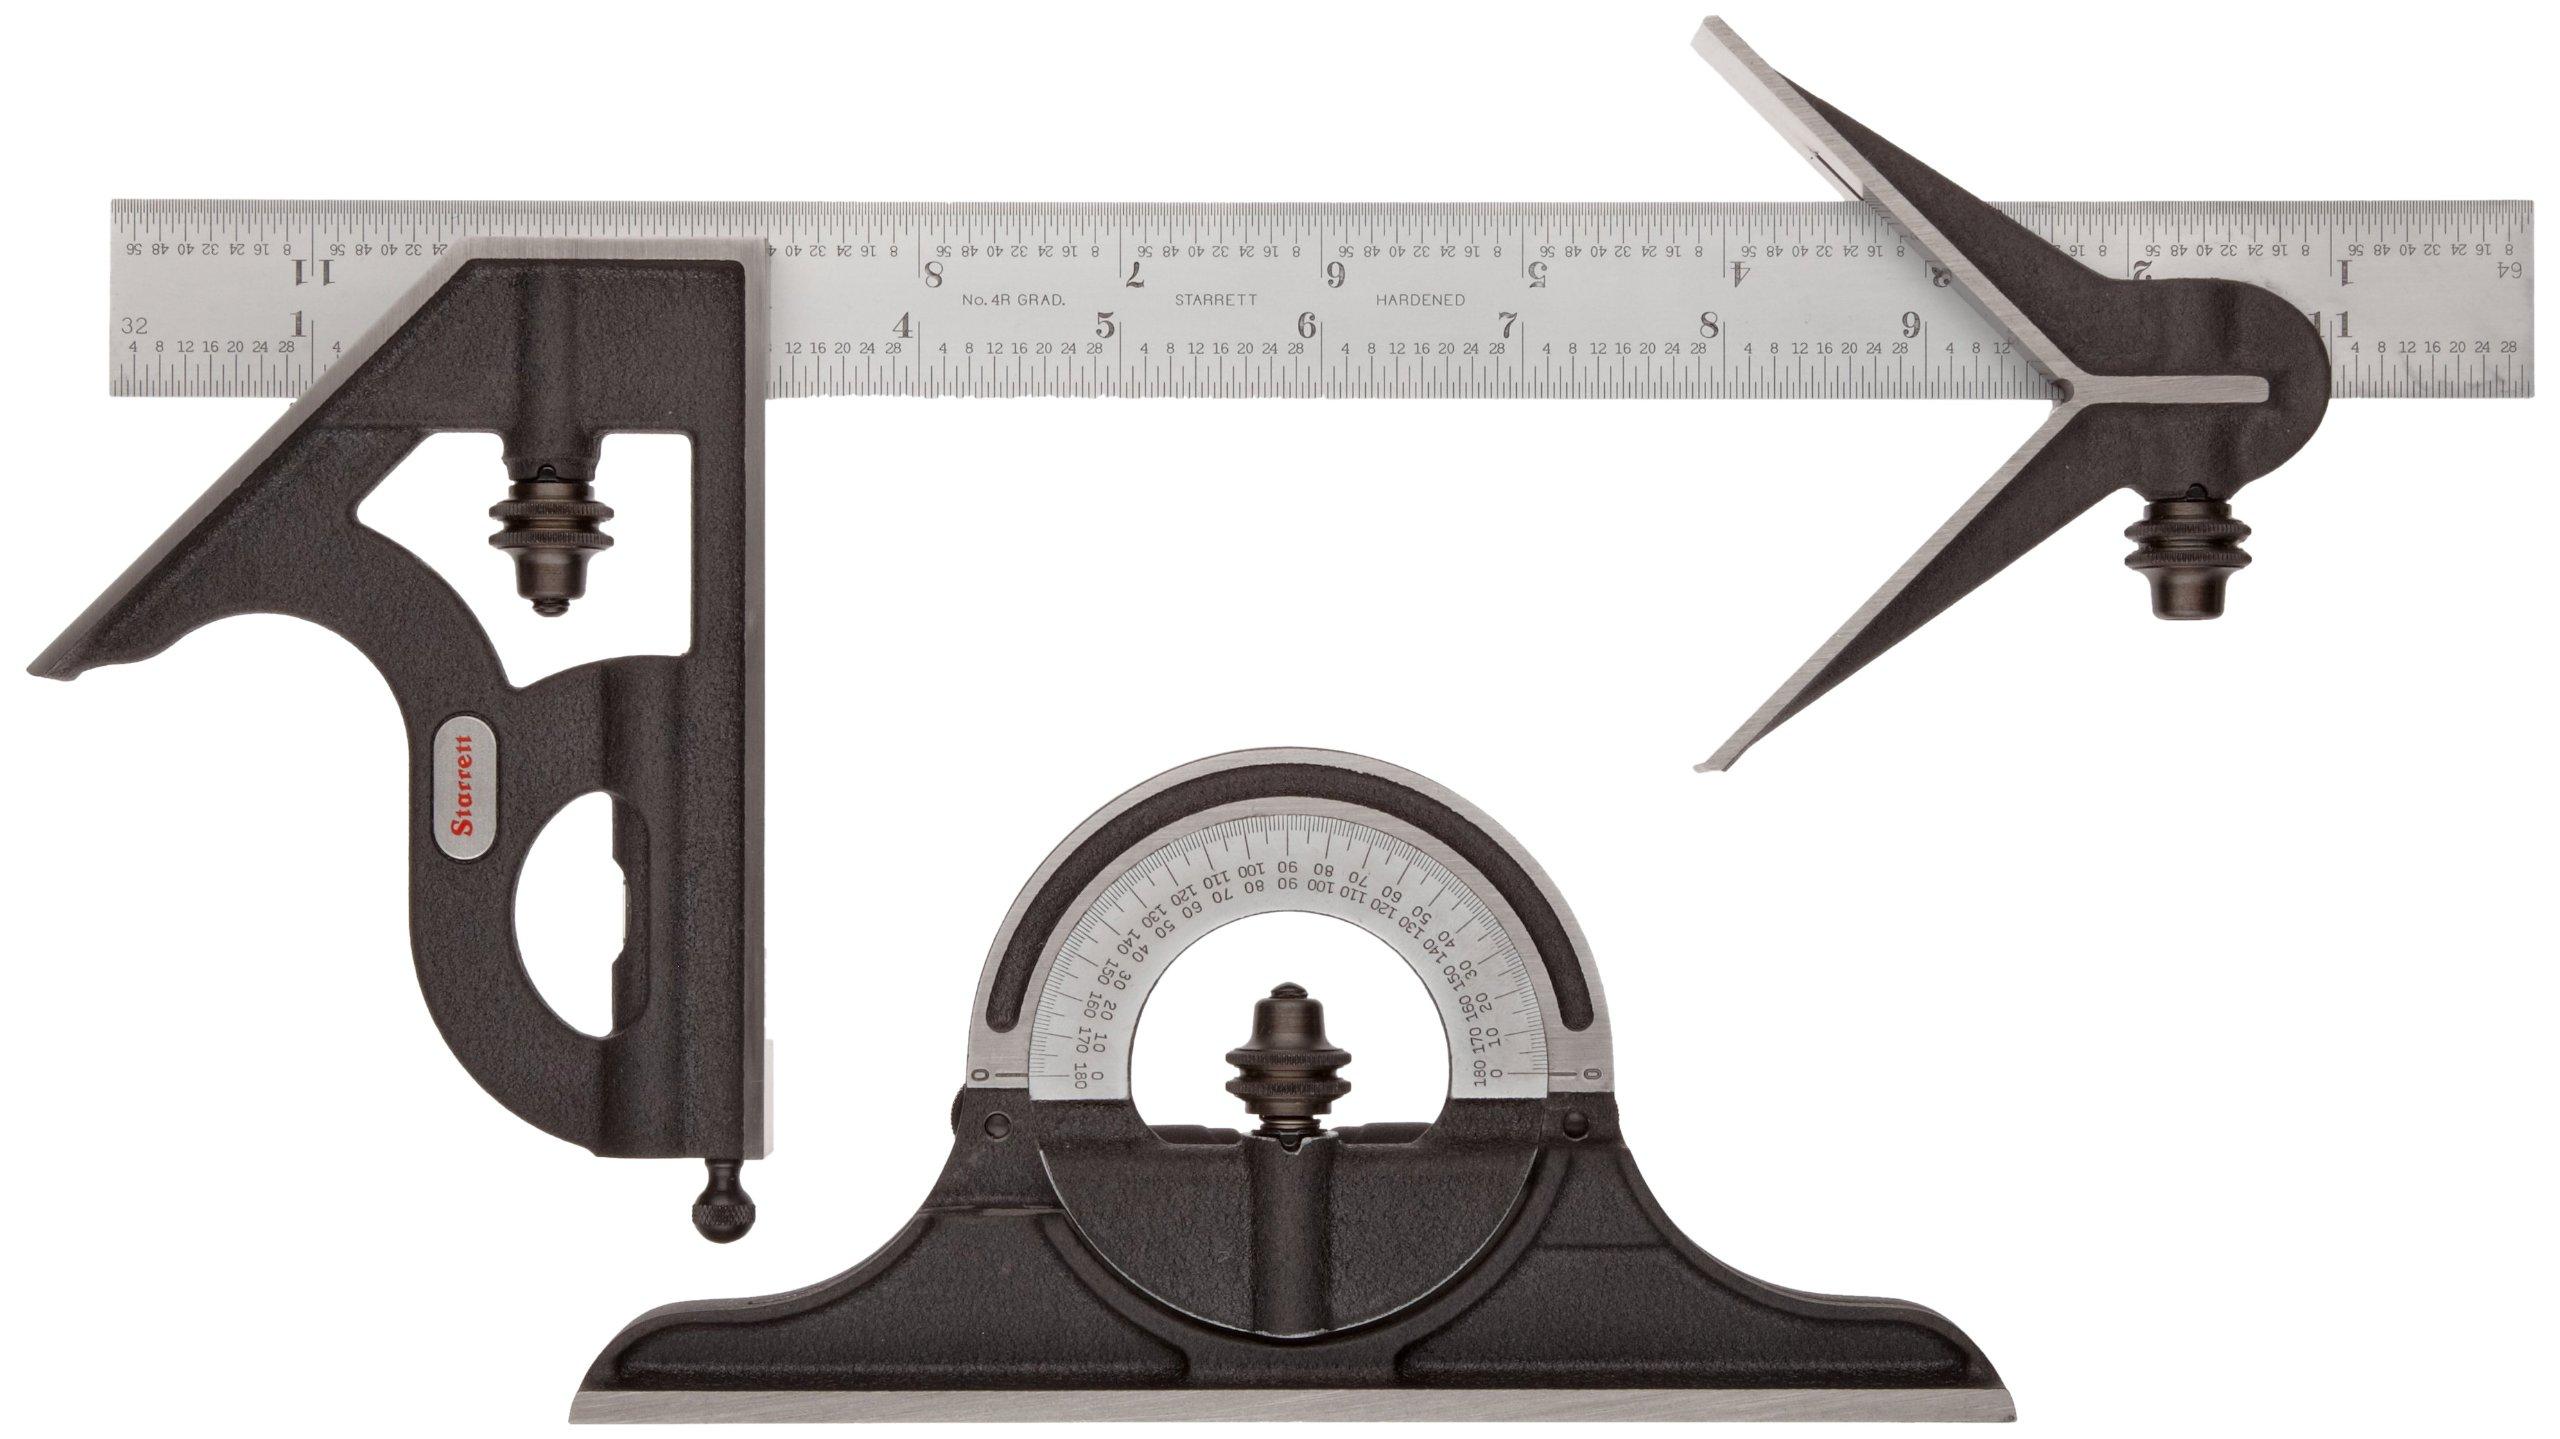 Starrett C435-12-4R Combination Set, Cast Iron Heads, Satin Chrome Blade, 12'', 4R Grad, by Starrett